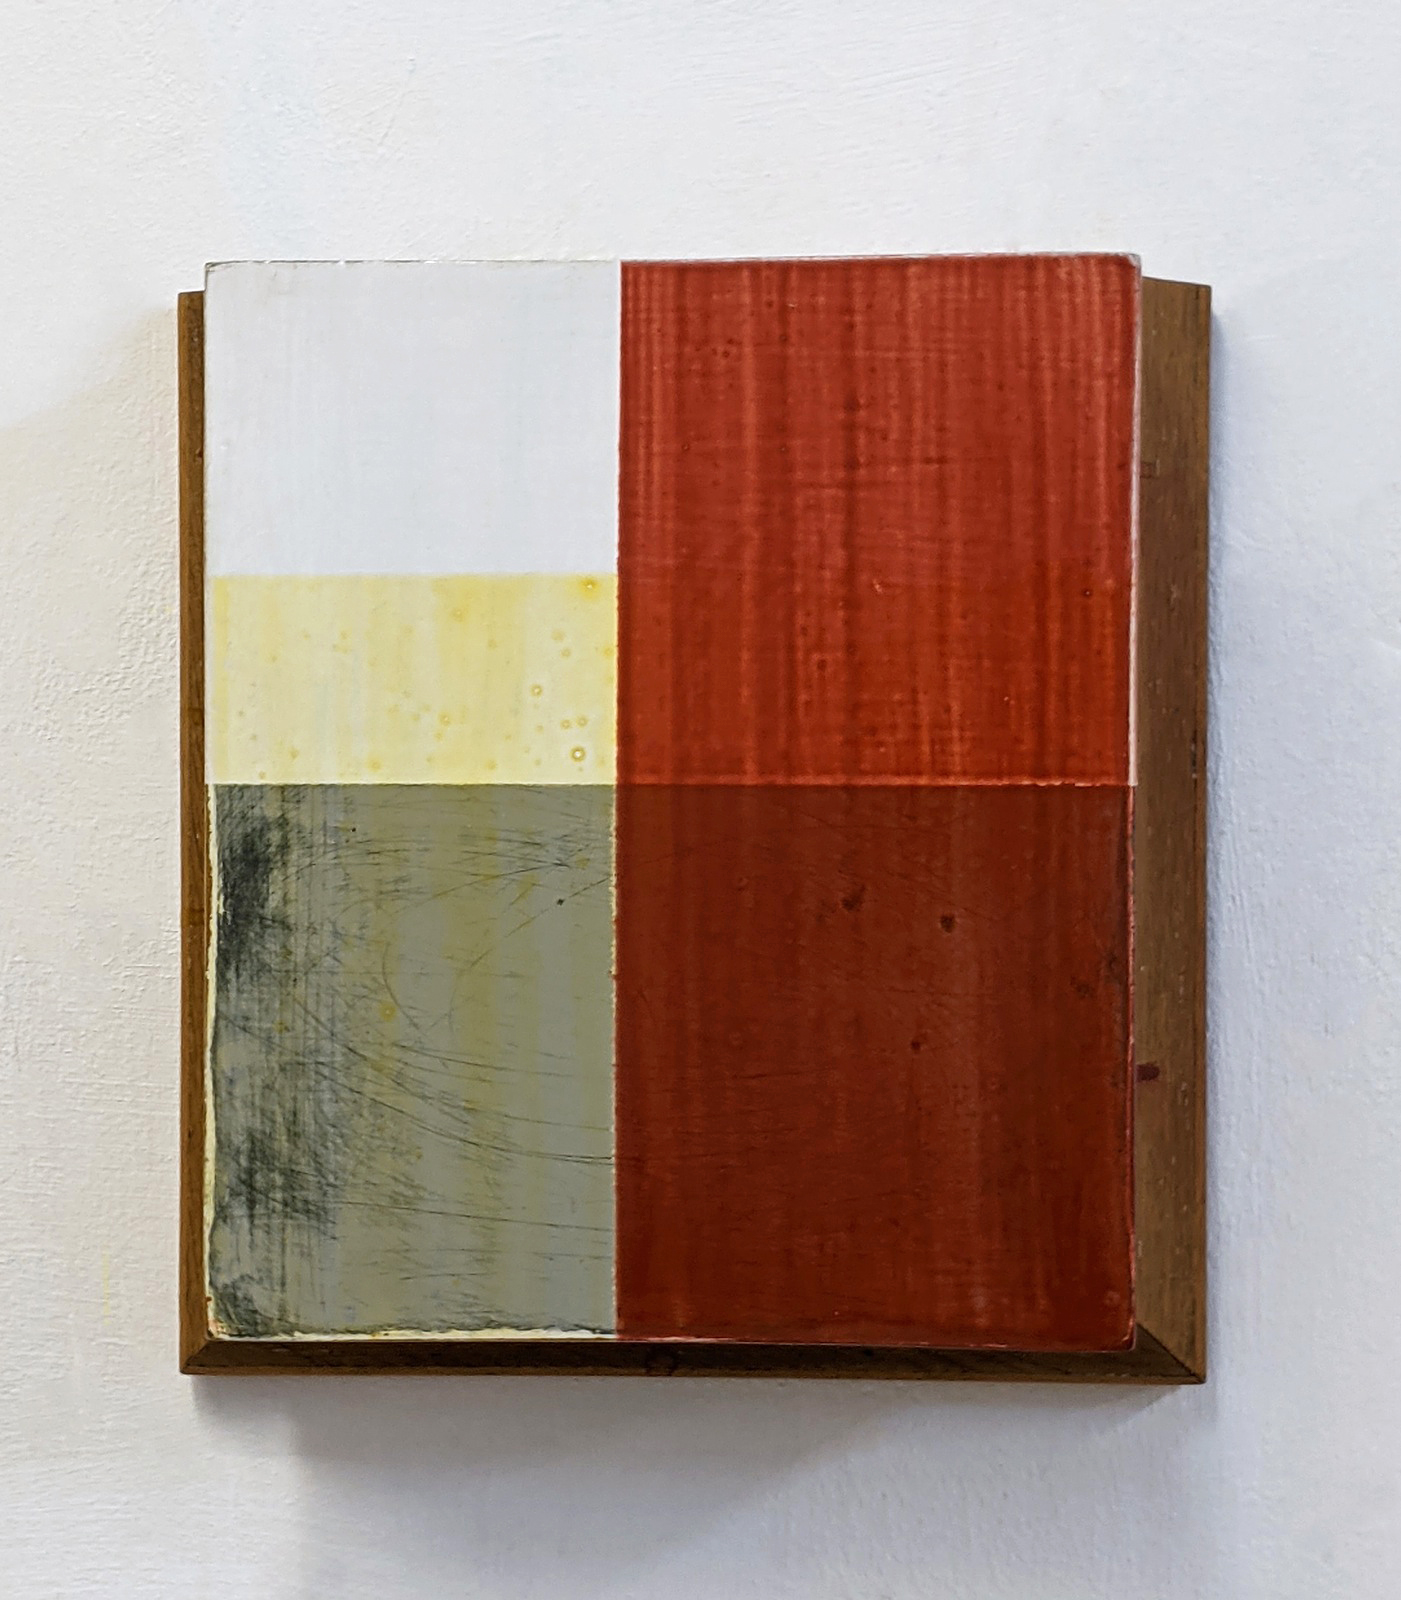 """Sockel II"", 31,5x33x11 cm, Acrylfarbe, Holz, 1993"